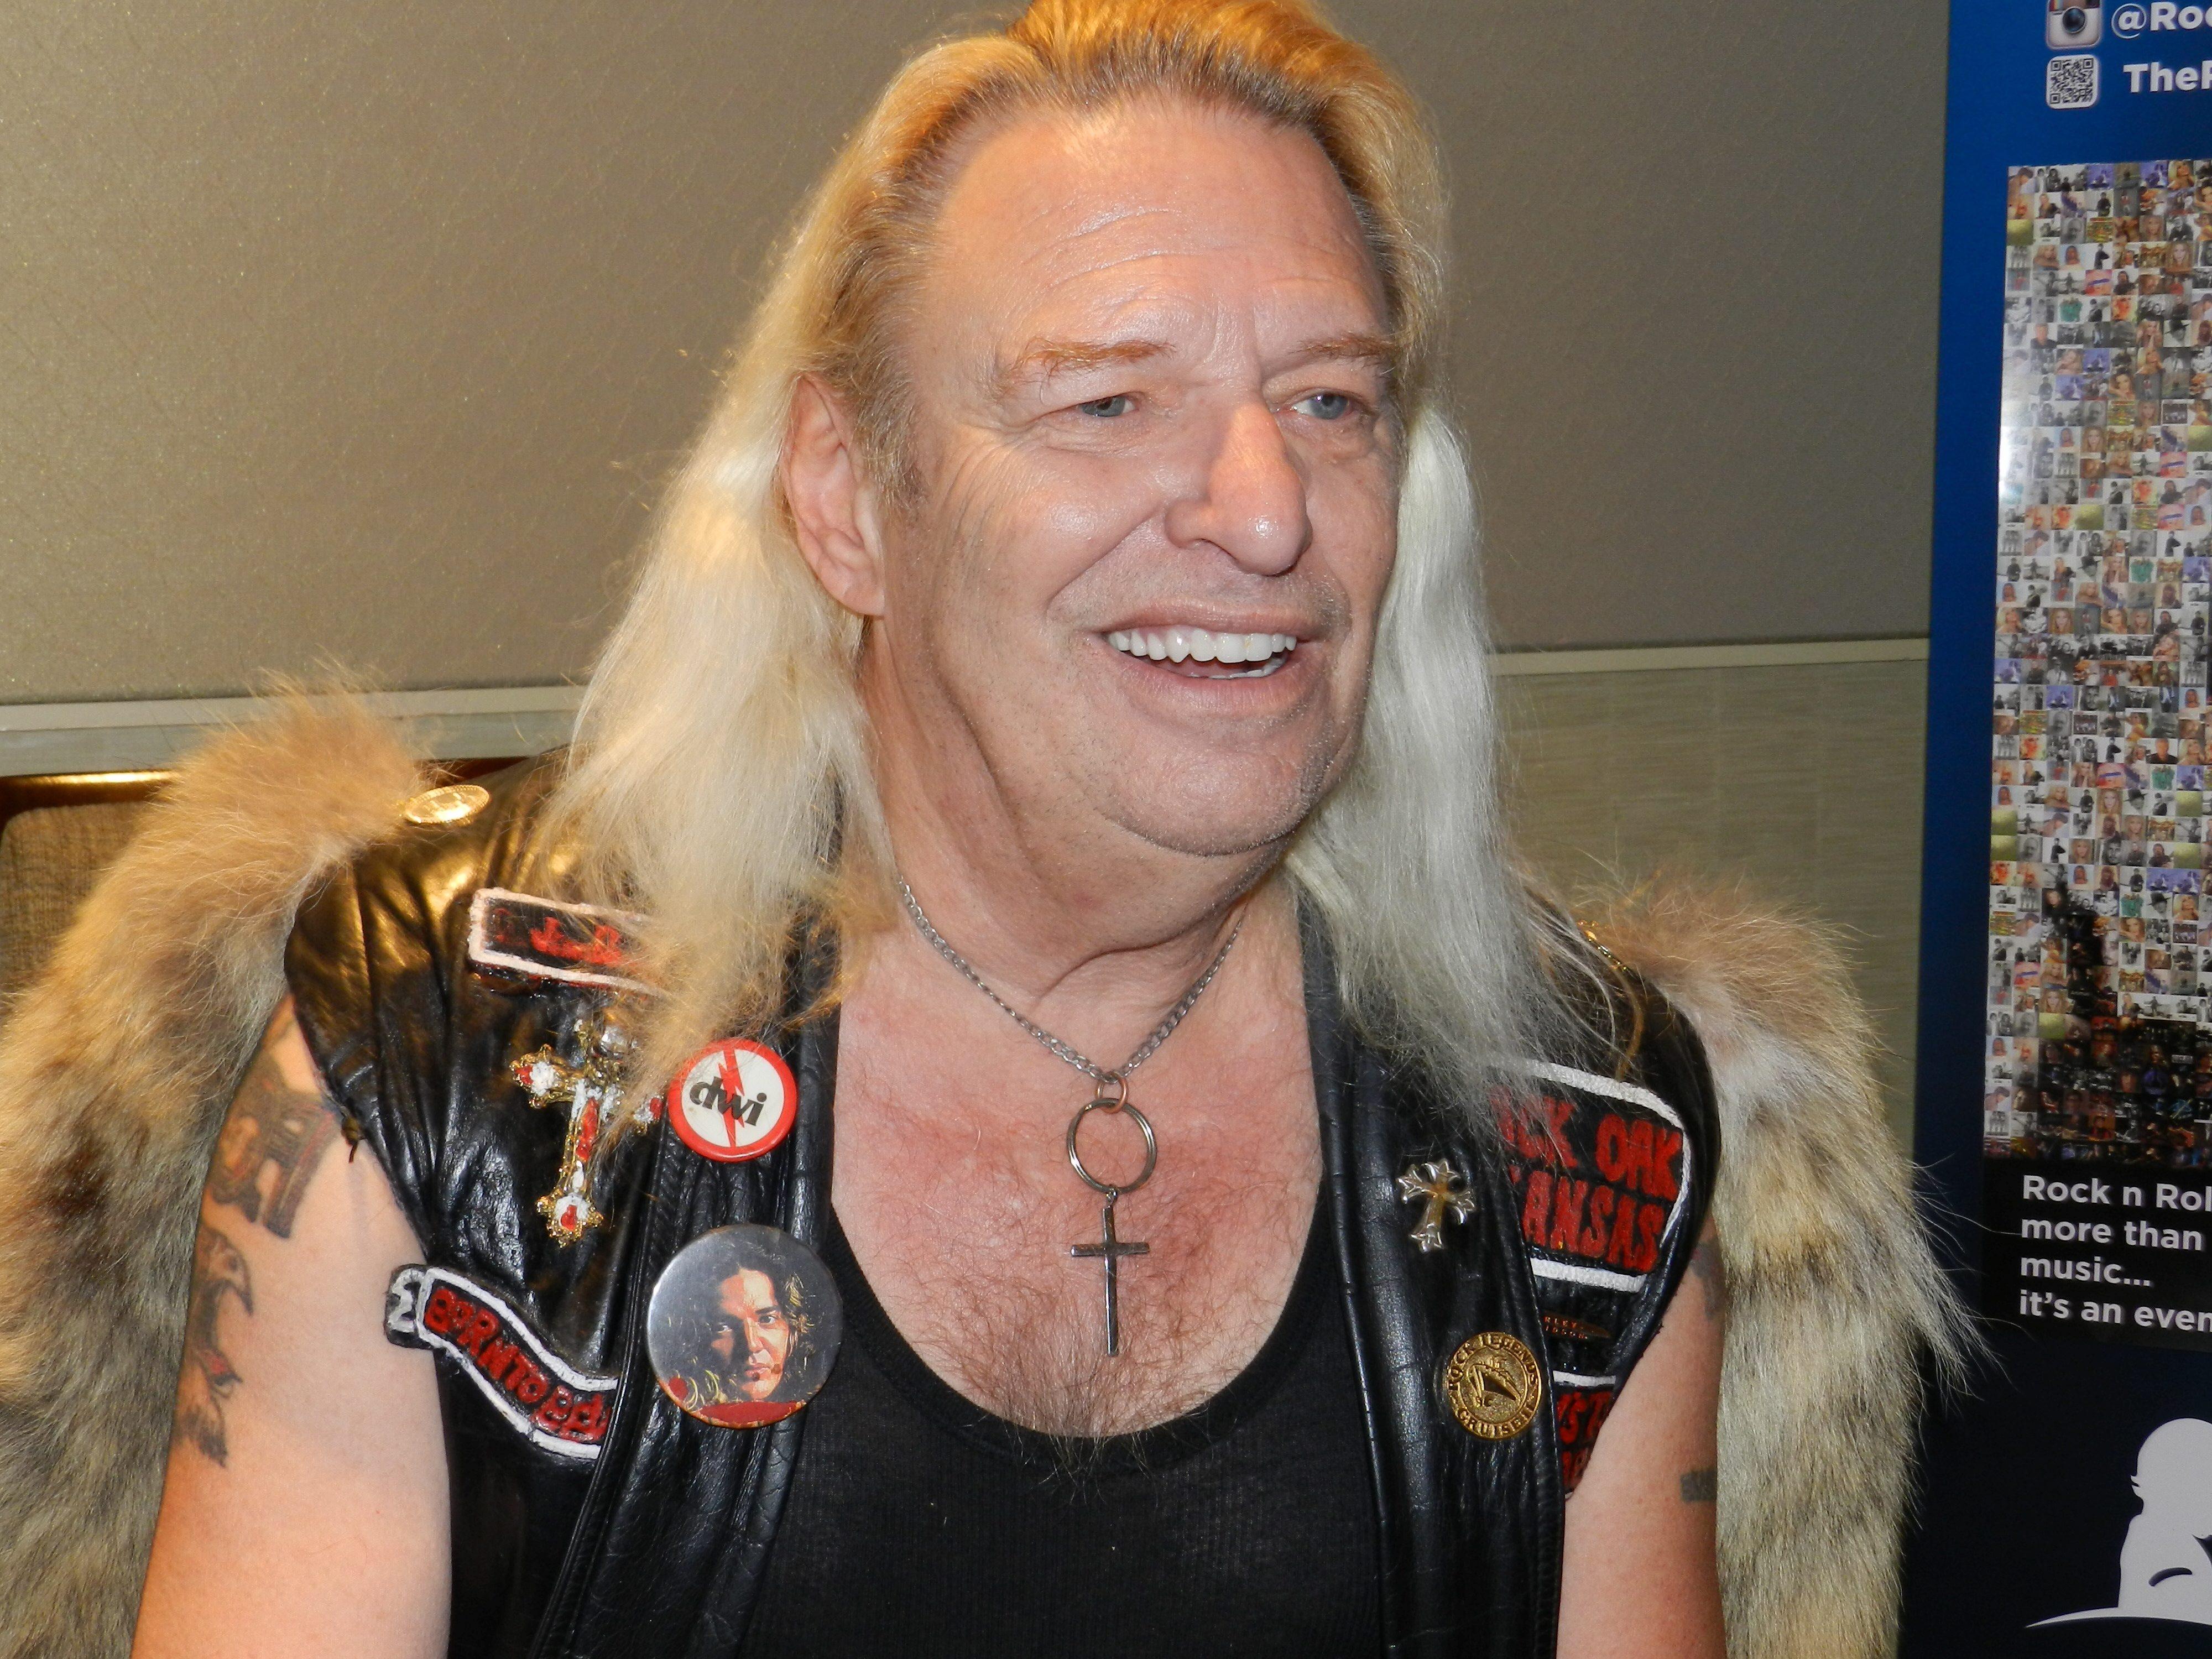 Jim \'Dandy\' Mangrum interview: Black Oak Arkansas frontman on Bill ...